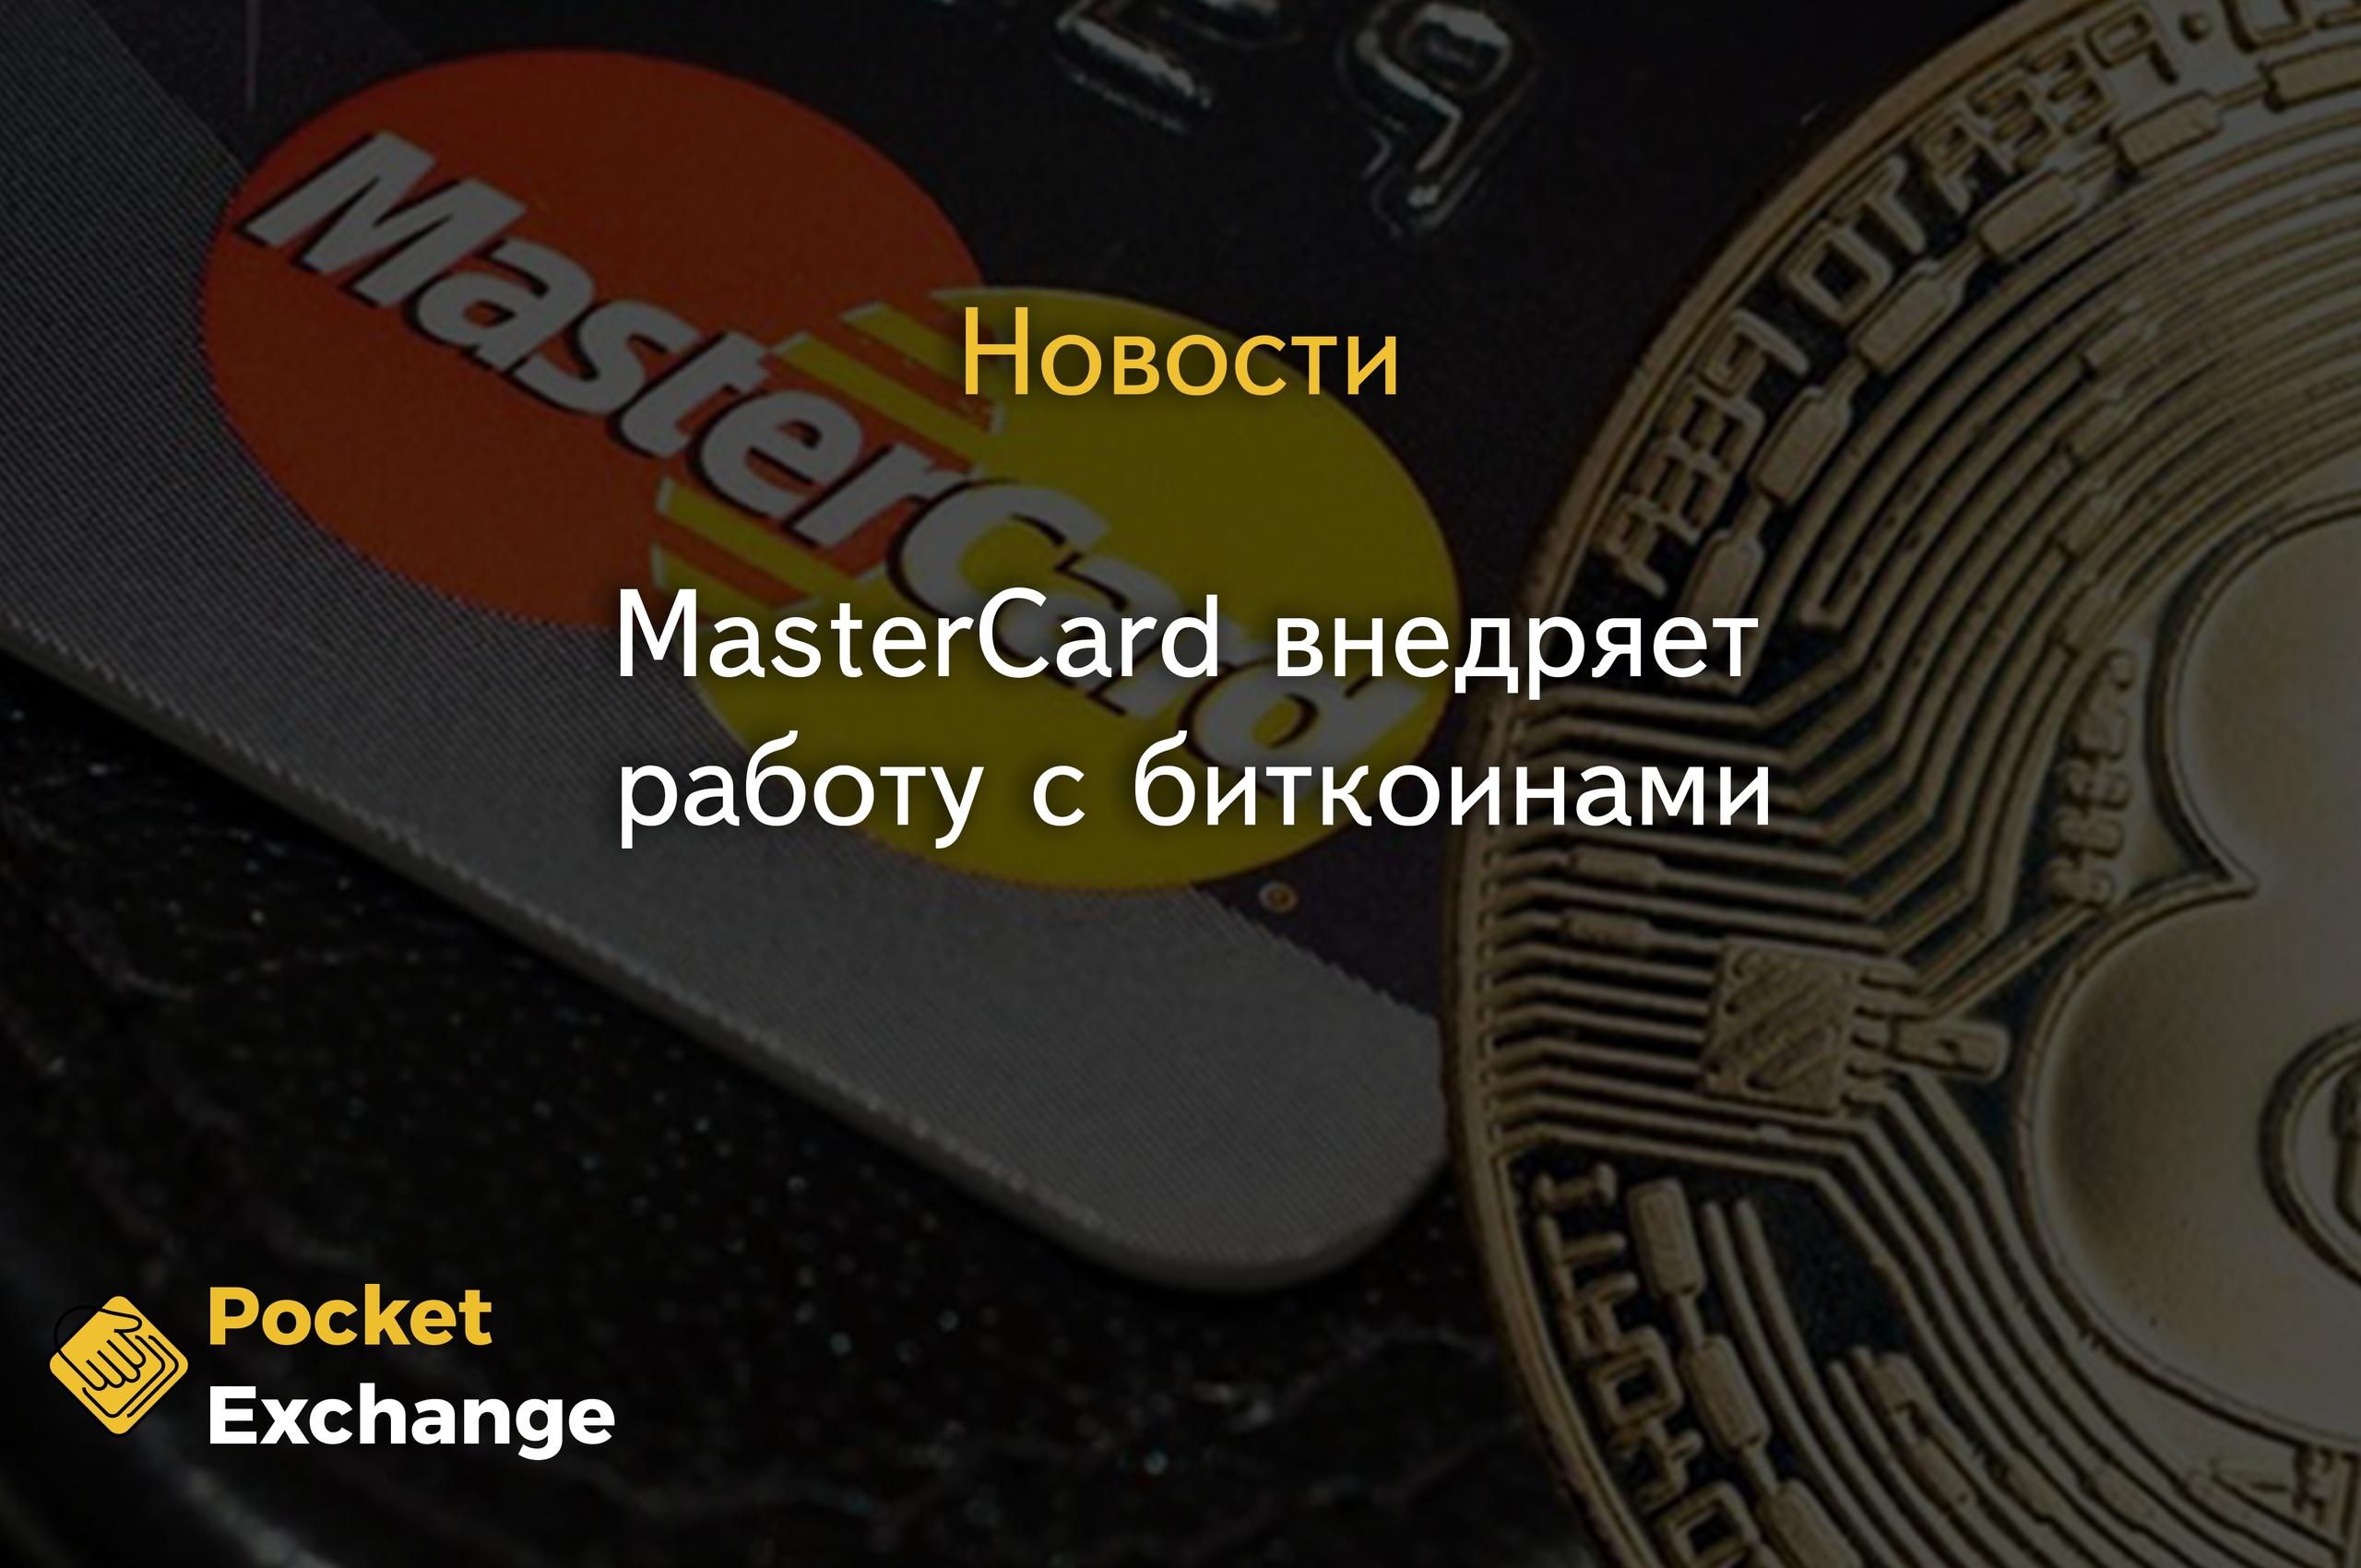 Обменять биткоин на мастеркард обучение торговли на бирже видео уроки с нуля ютуб